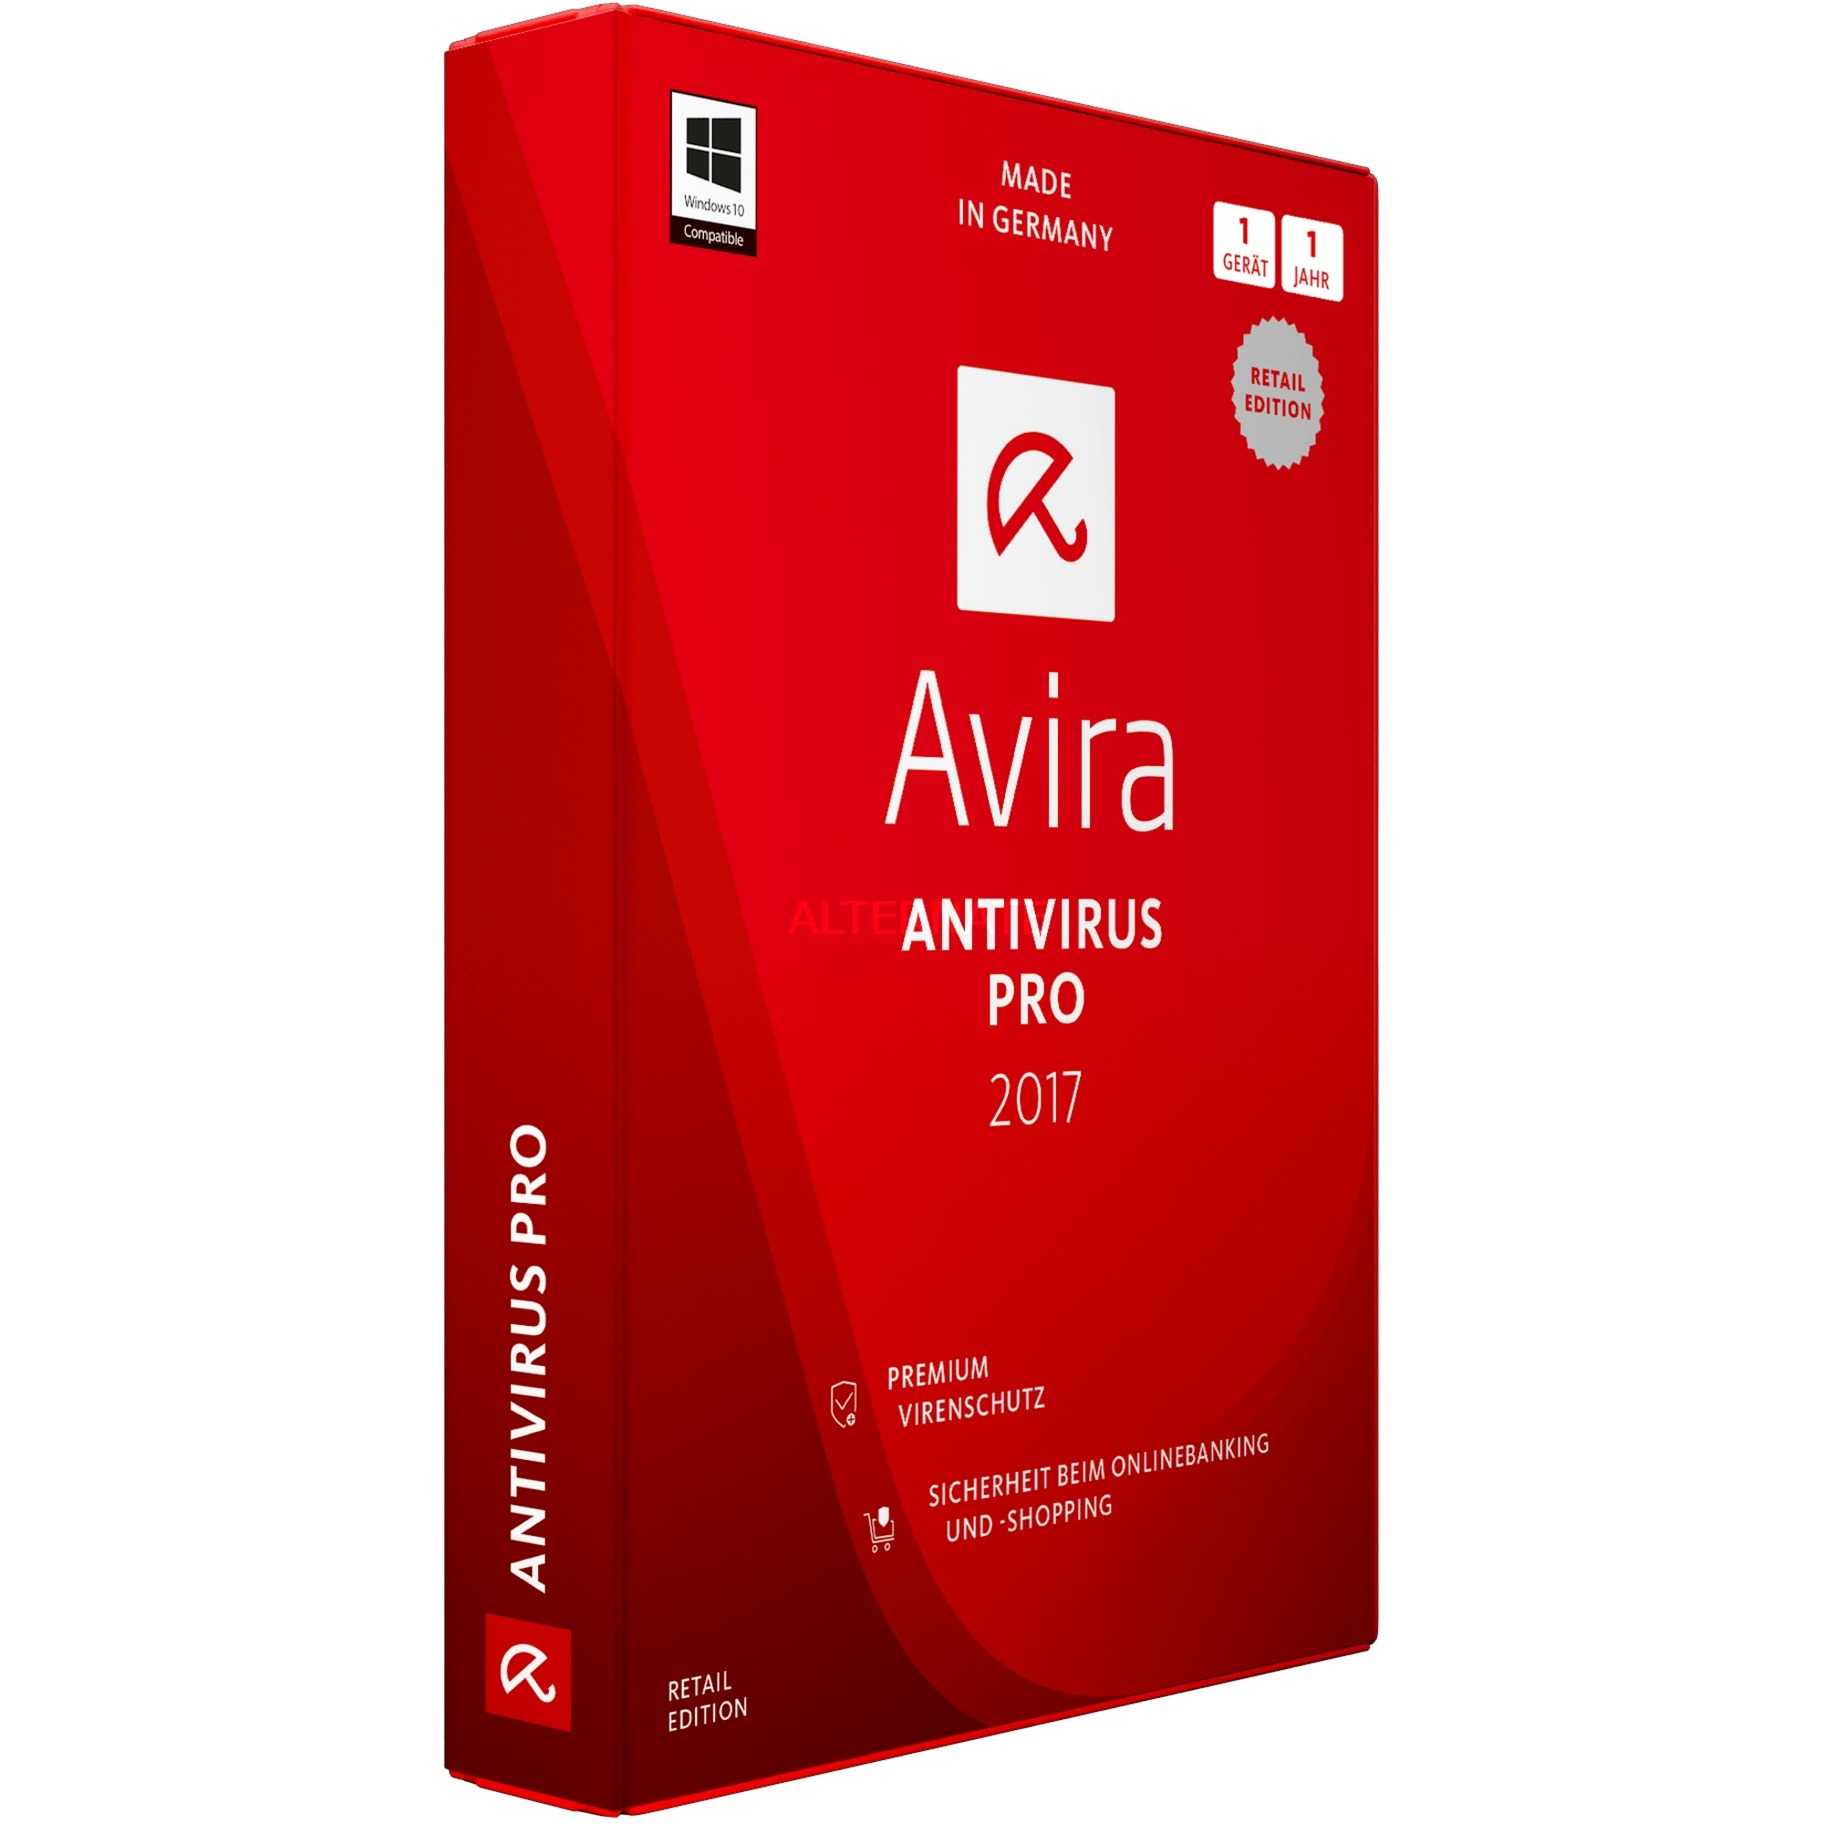 AntiVirus Pro 2017 Full license 1usuario(s) 1año(s) Alemán, Software